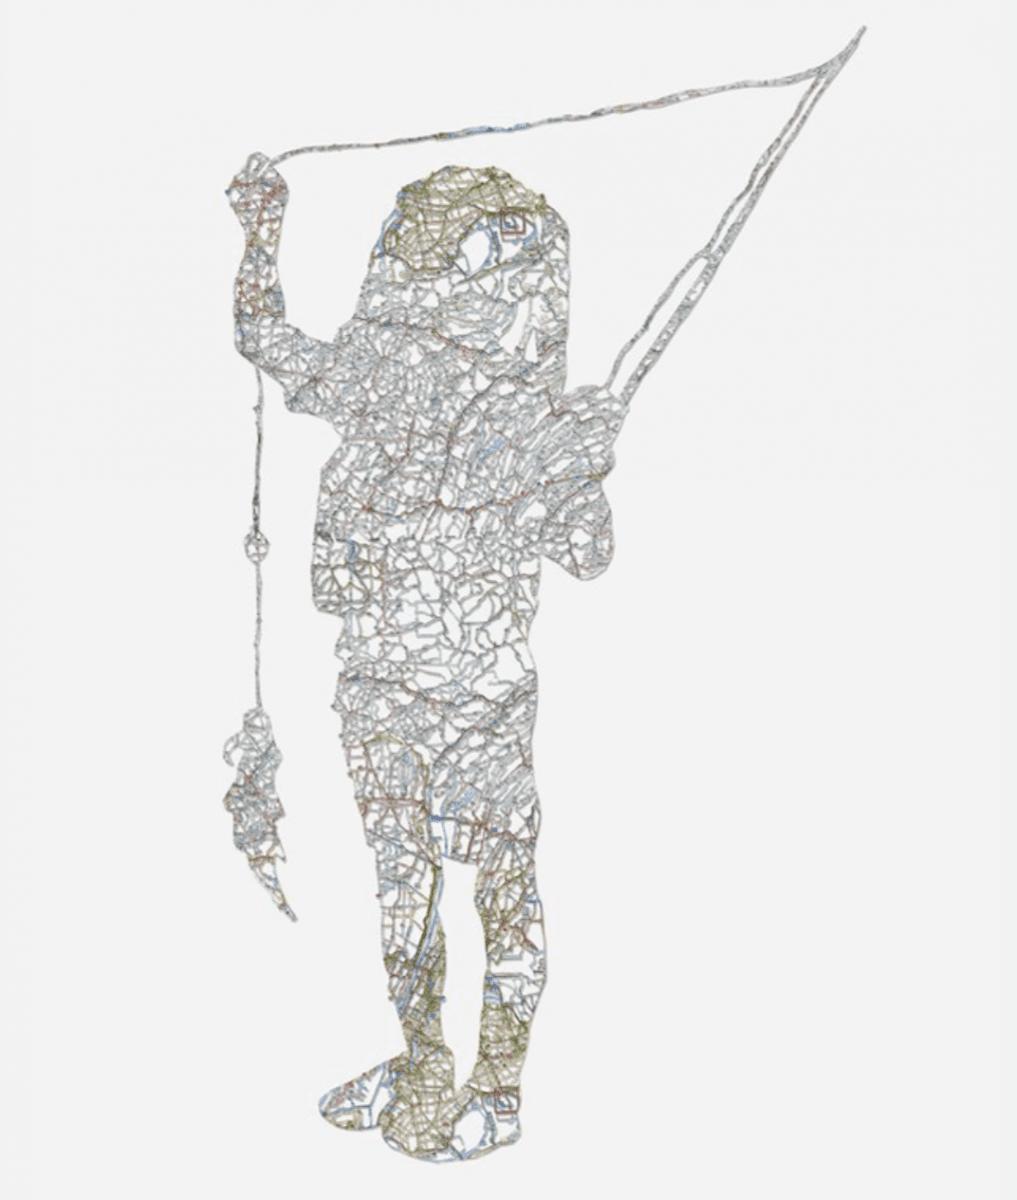 Nikki Rosato, Untitled (Childhood Portrait), hand cut road map, 47 x 27 inches, 2011.